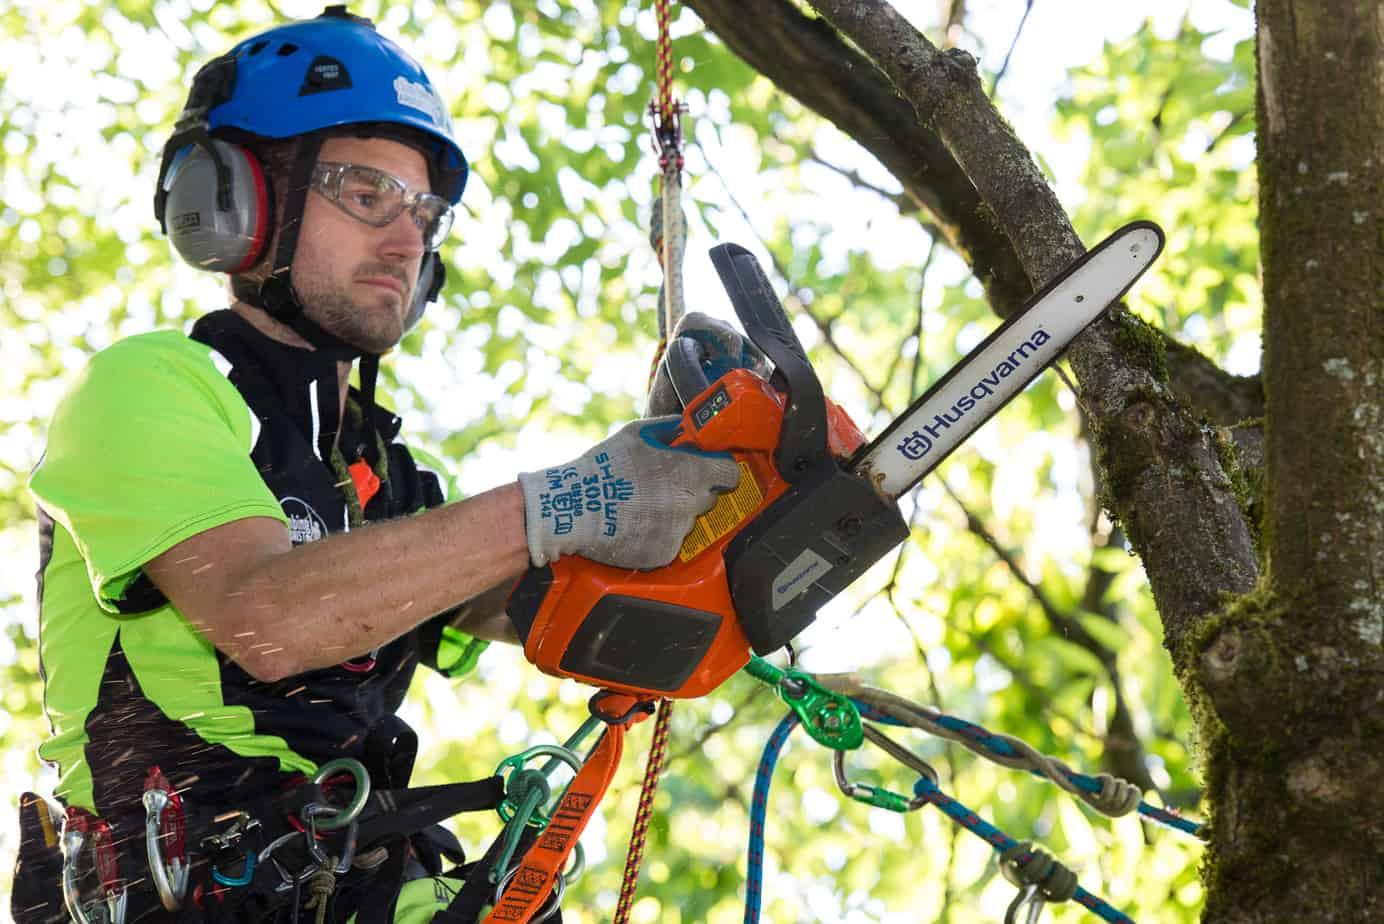 Arborist Dan Holliday using the Husqvarna battery chainsaw